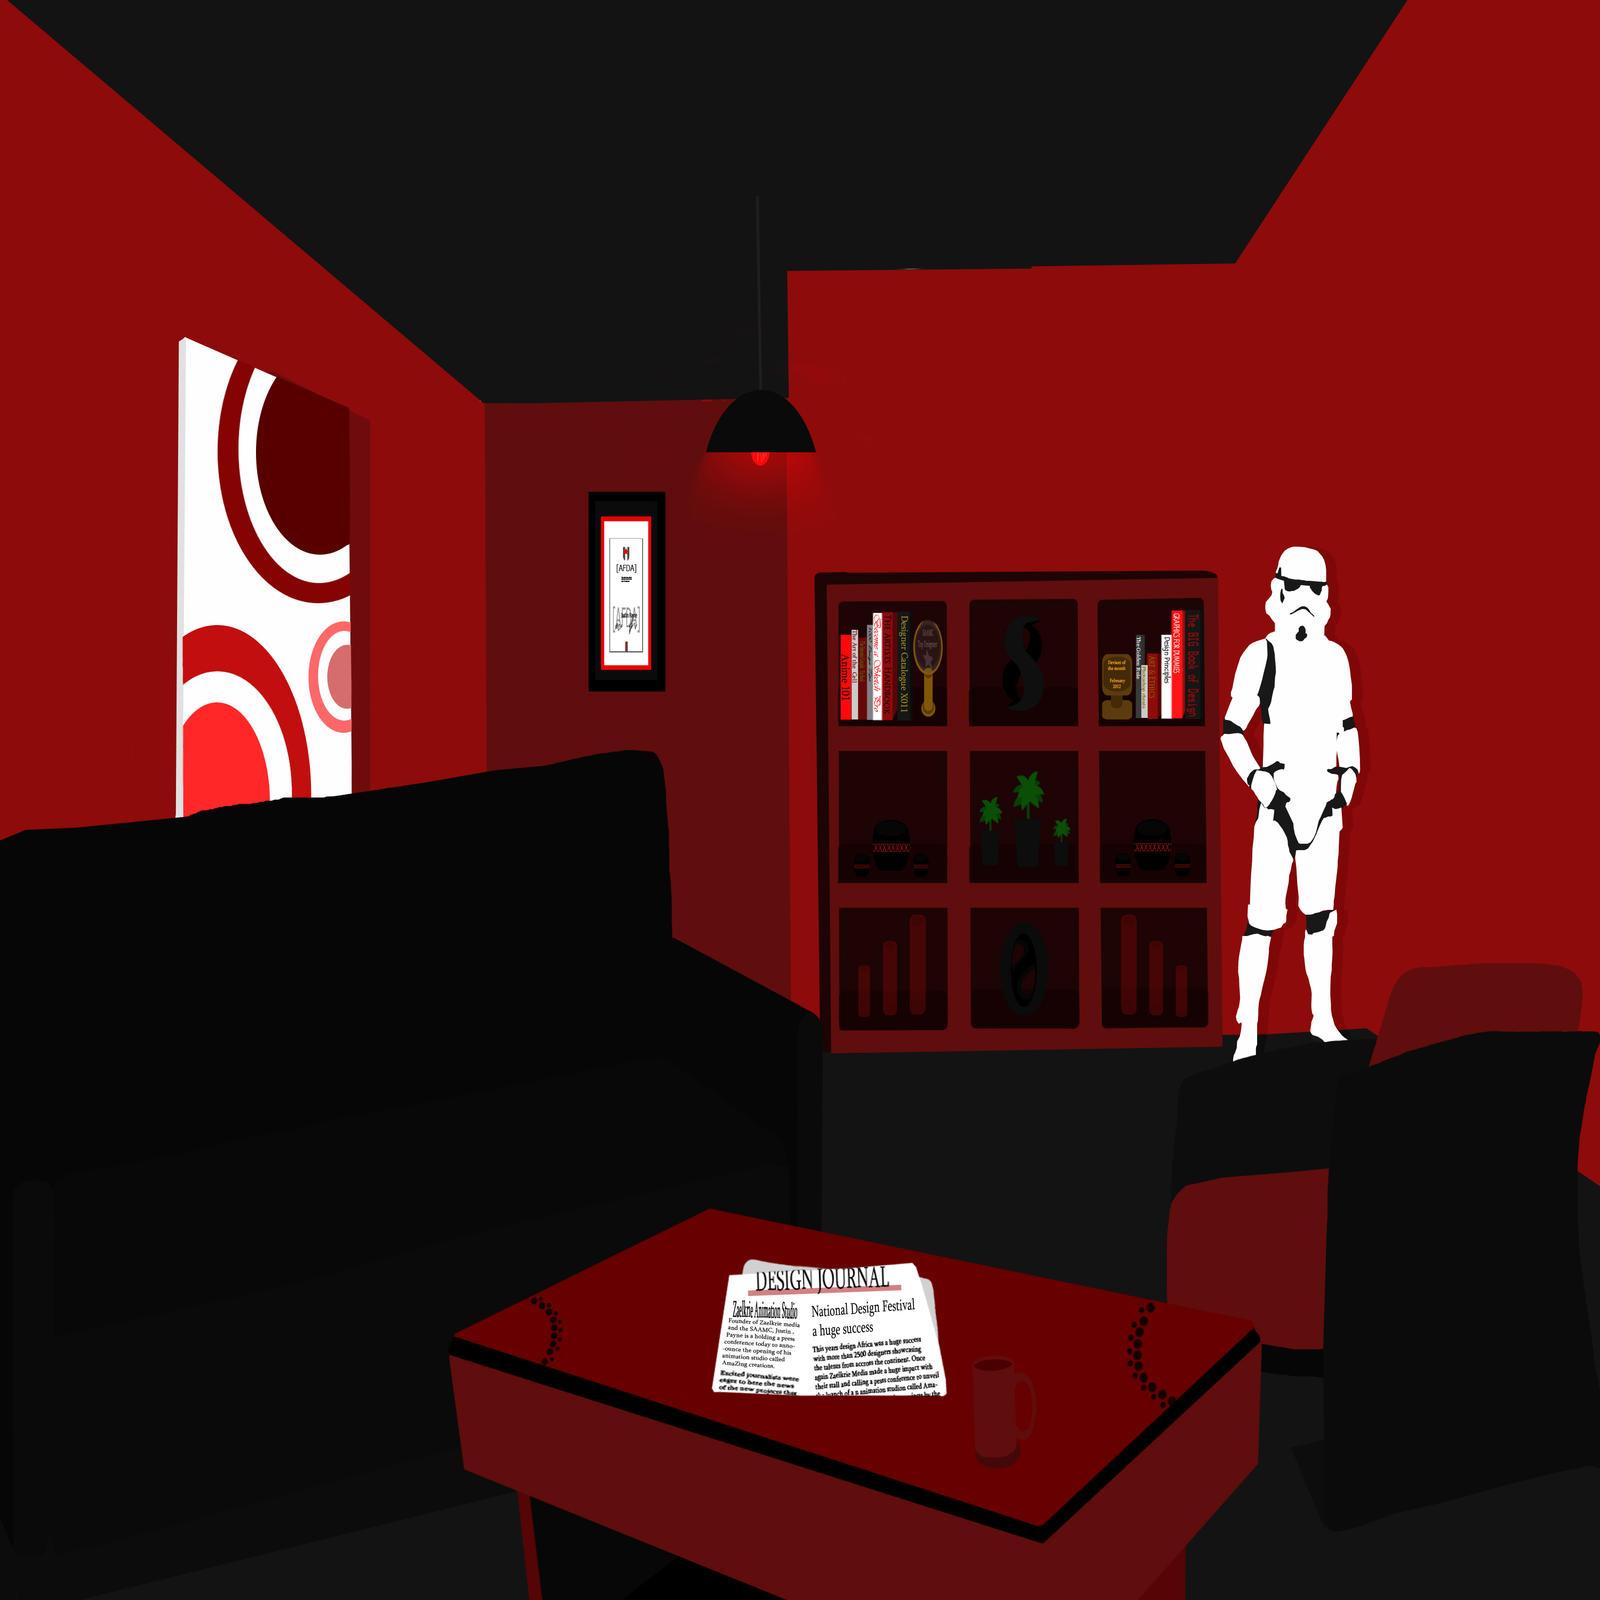 room design black and red by zaelkrie on deviantart